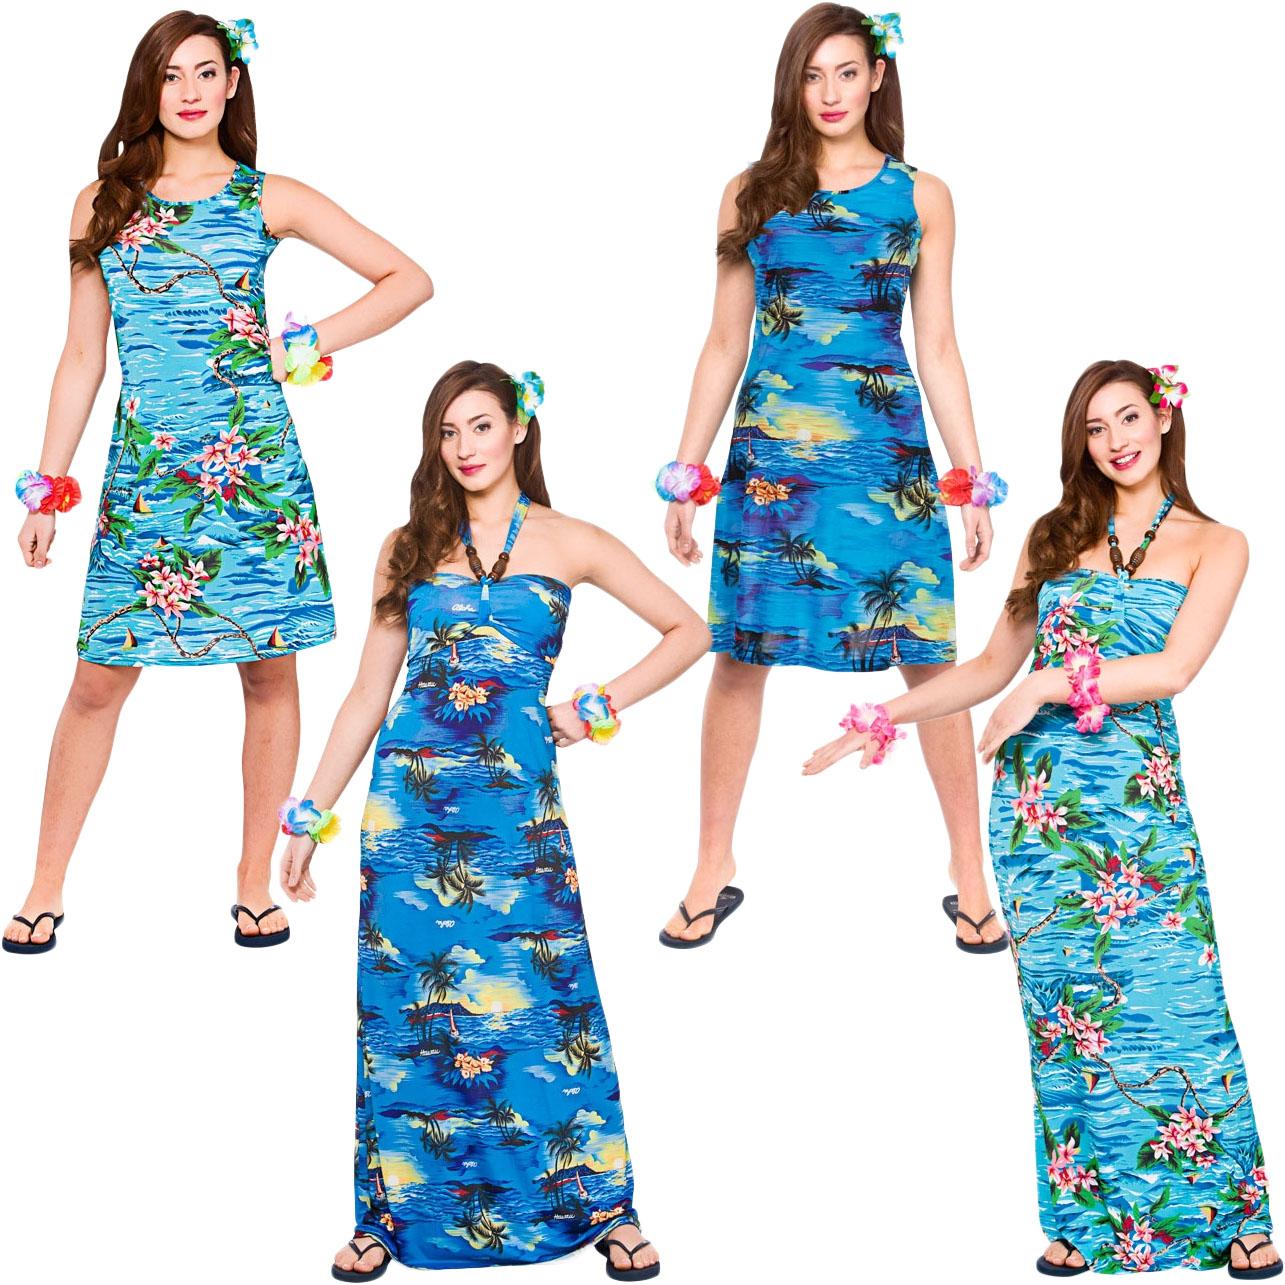 Hawaiian Ladies Fancy Dress Tropical Beach Hawaii Womens Adults Costume Outfit | eBay